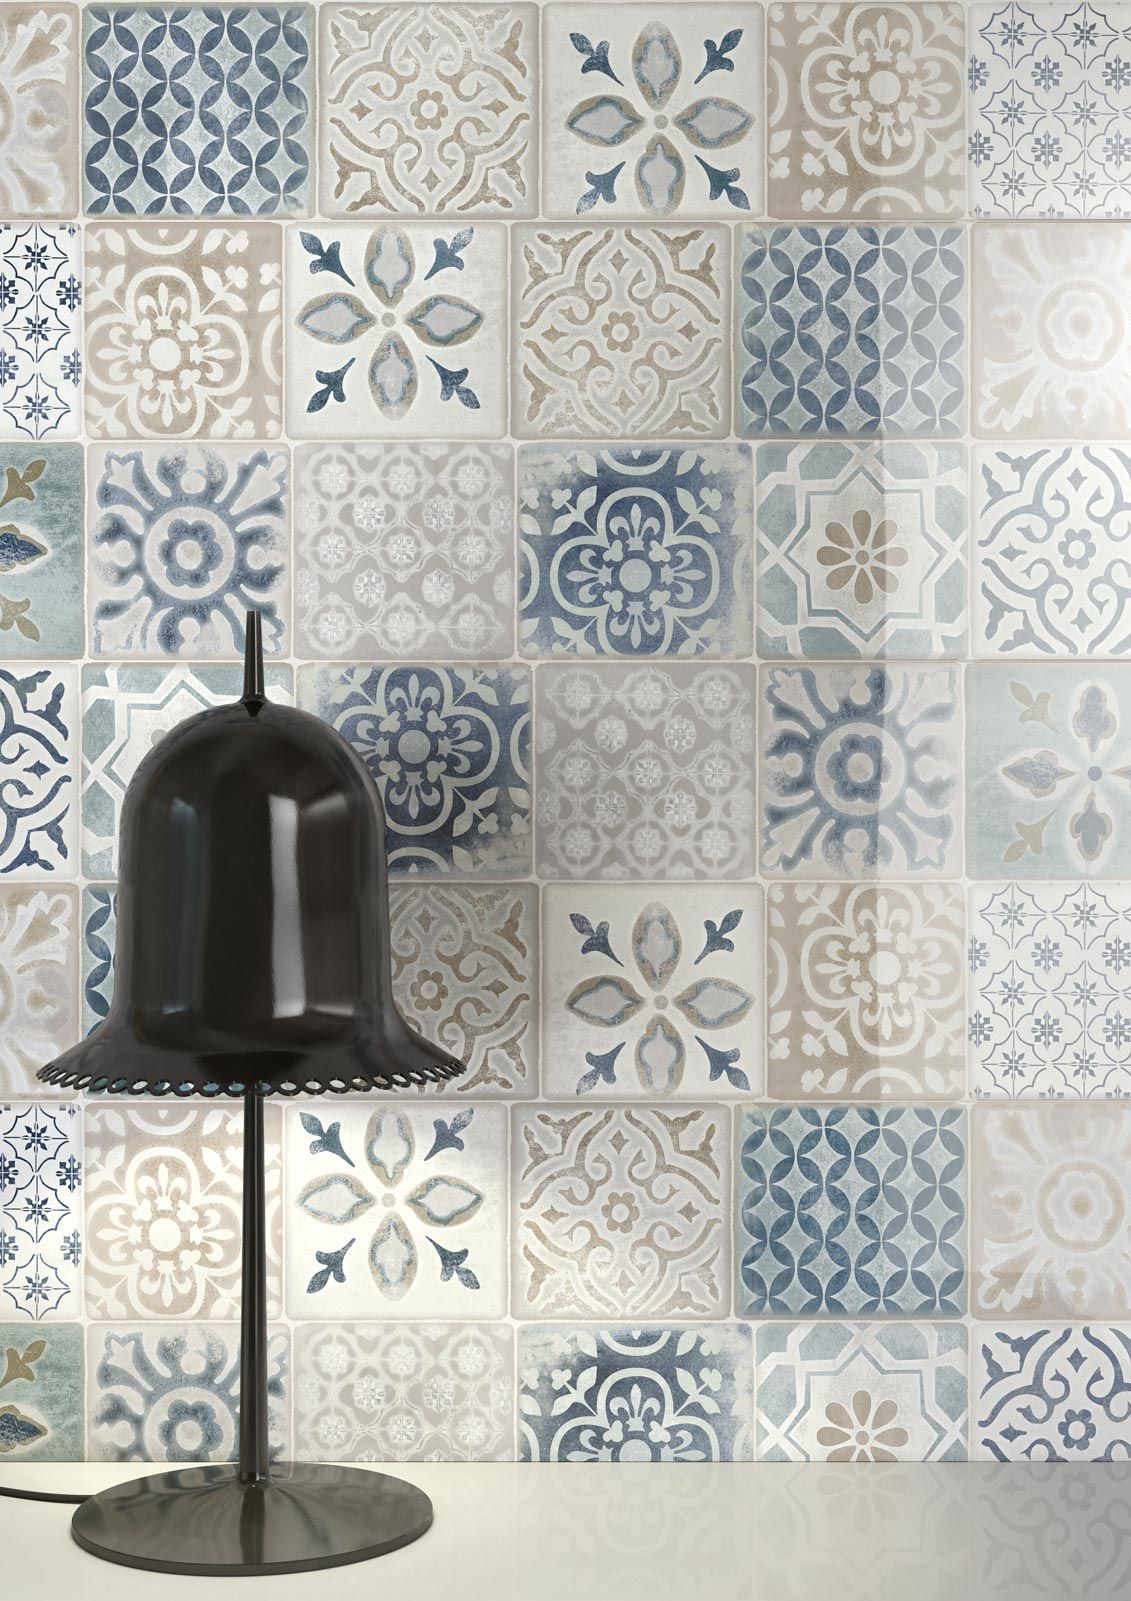 Come Decorare Piastrelle Cucina aqua mix decor wall tile #porcelain | piastrelle di cemento